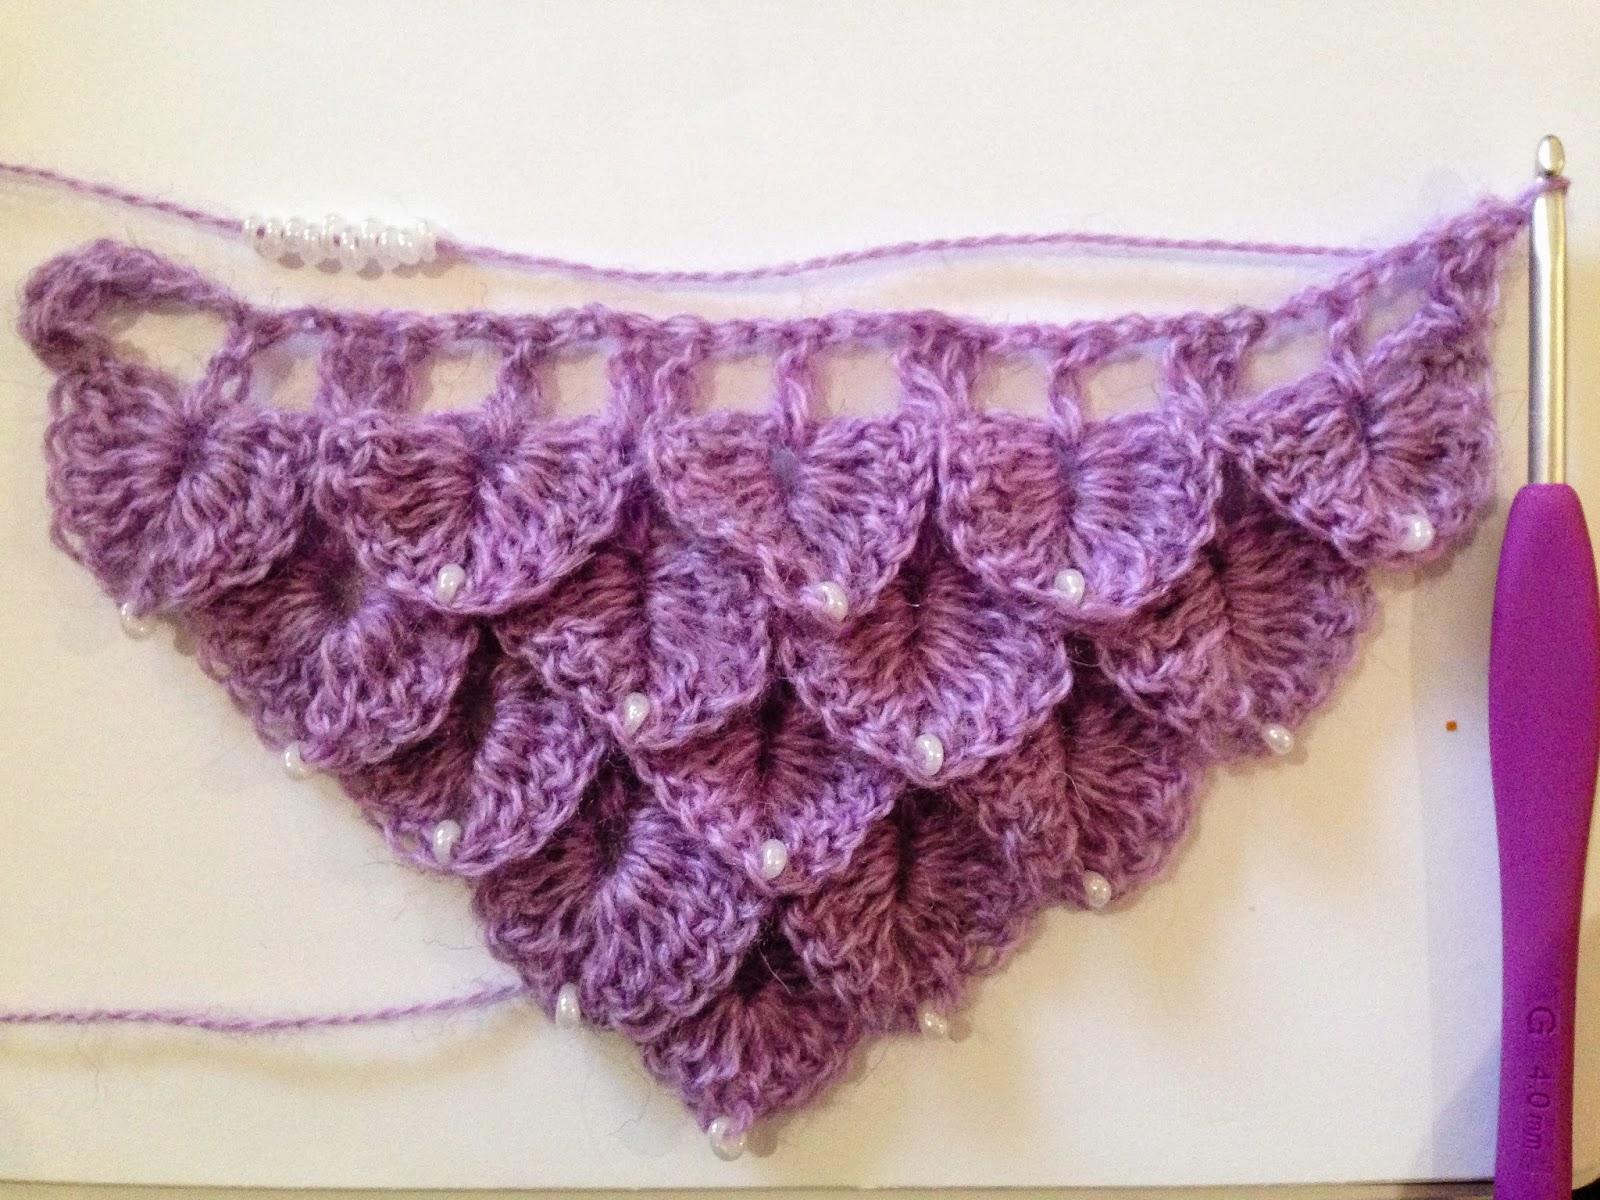 Knit Crocodile Stitch In The Round : crochet rockstar: Crochet Beaded Crocodile Stitch Scarf